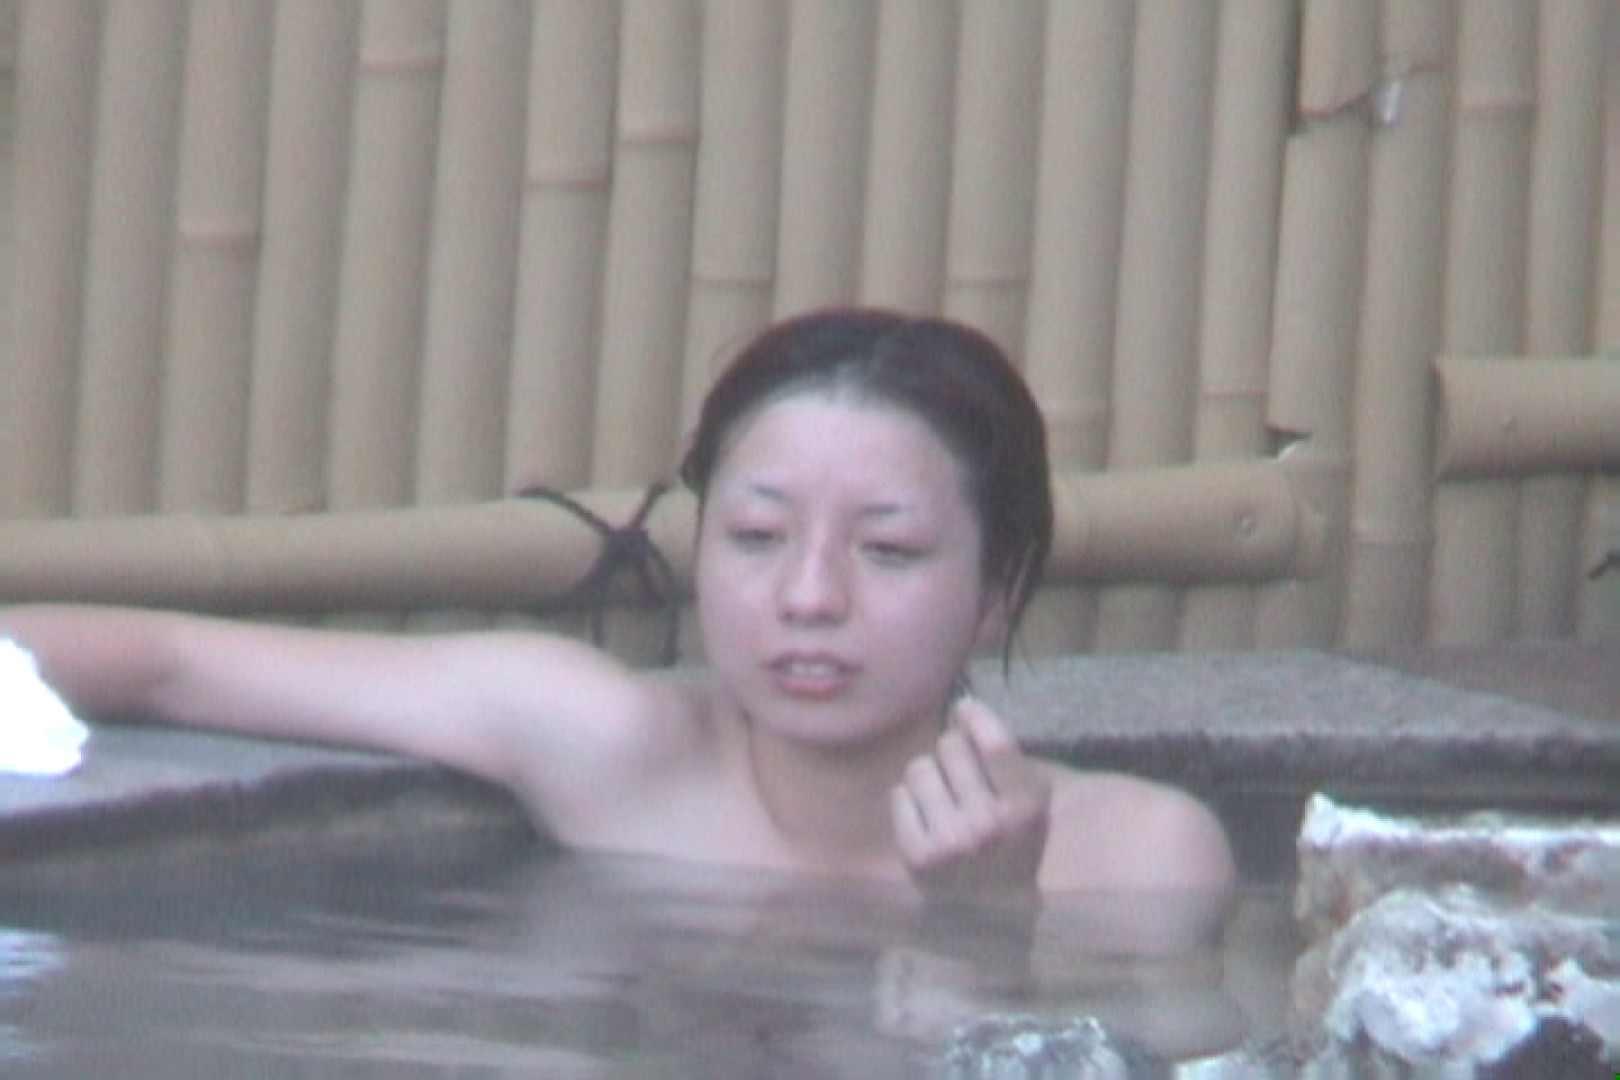 Aquaな露天風呂Vol.608 露天風呂突入 | 盗撮師作品  95pic 85